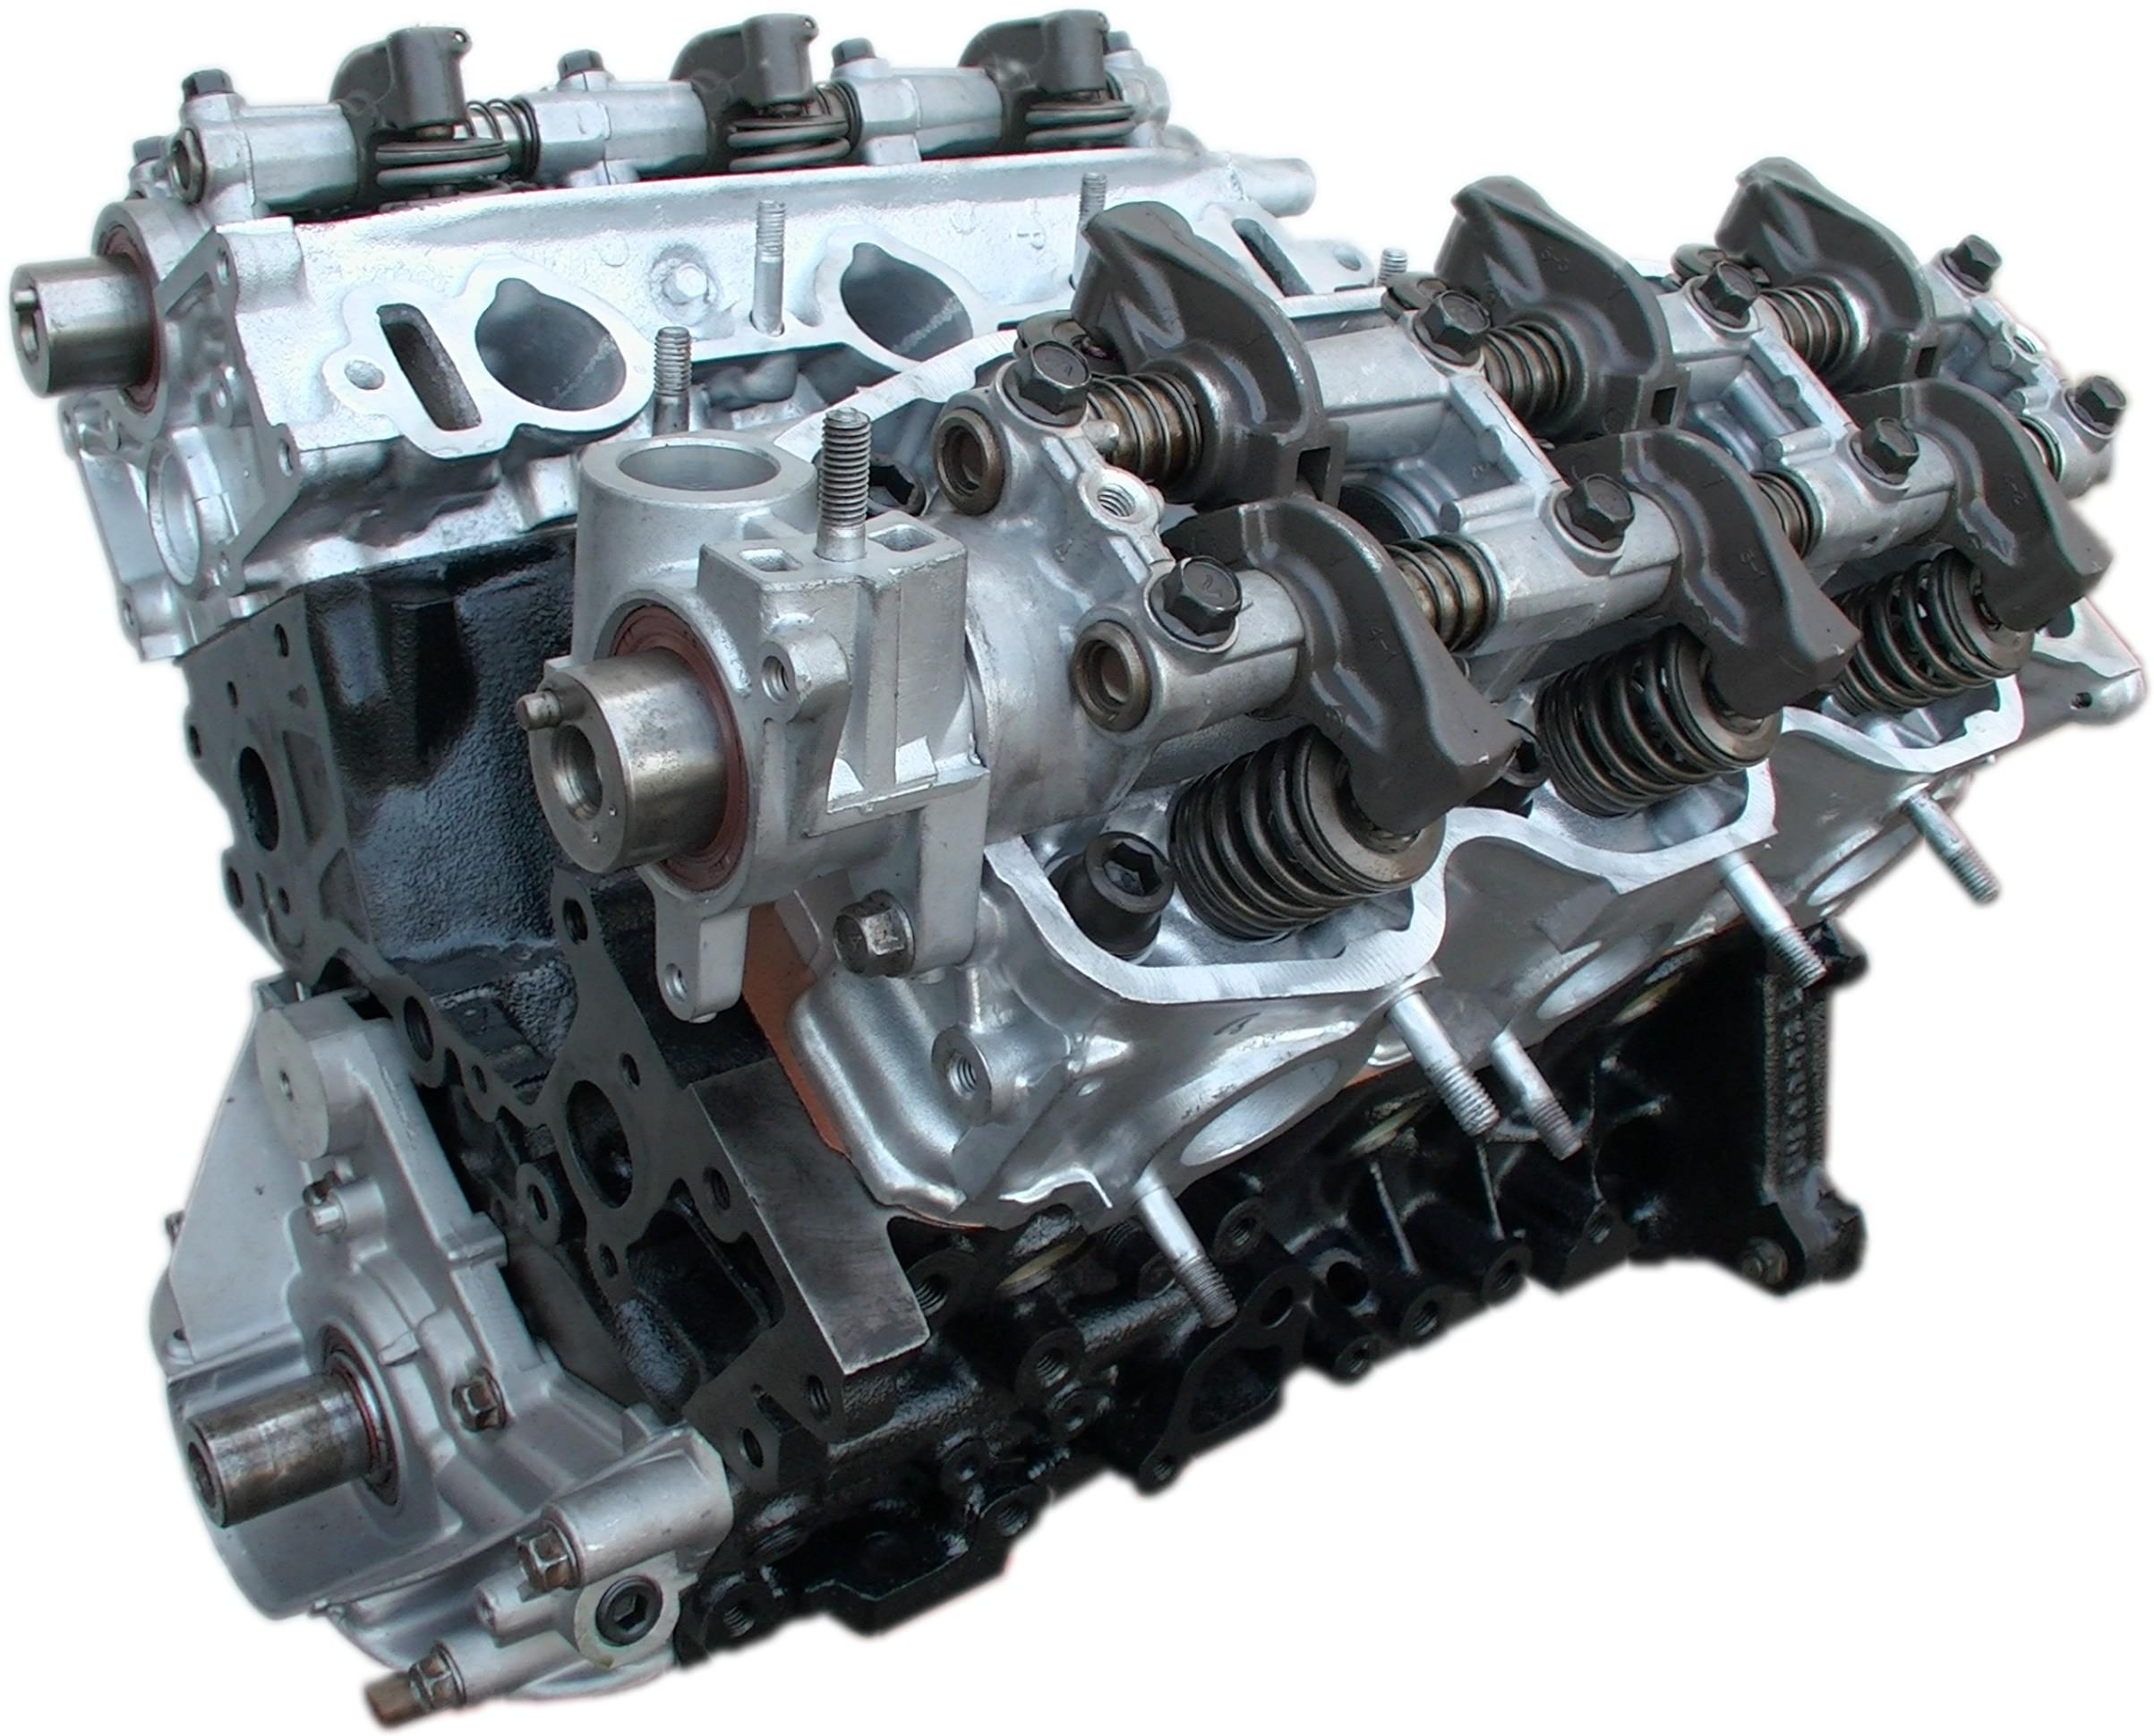 Rebuilt Dodge Caravan 6G72 3.0L Engine « Kar King Auto